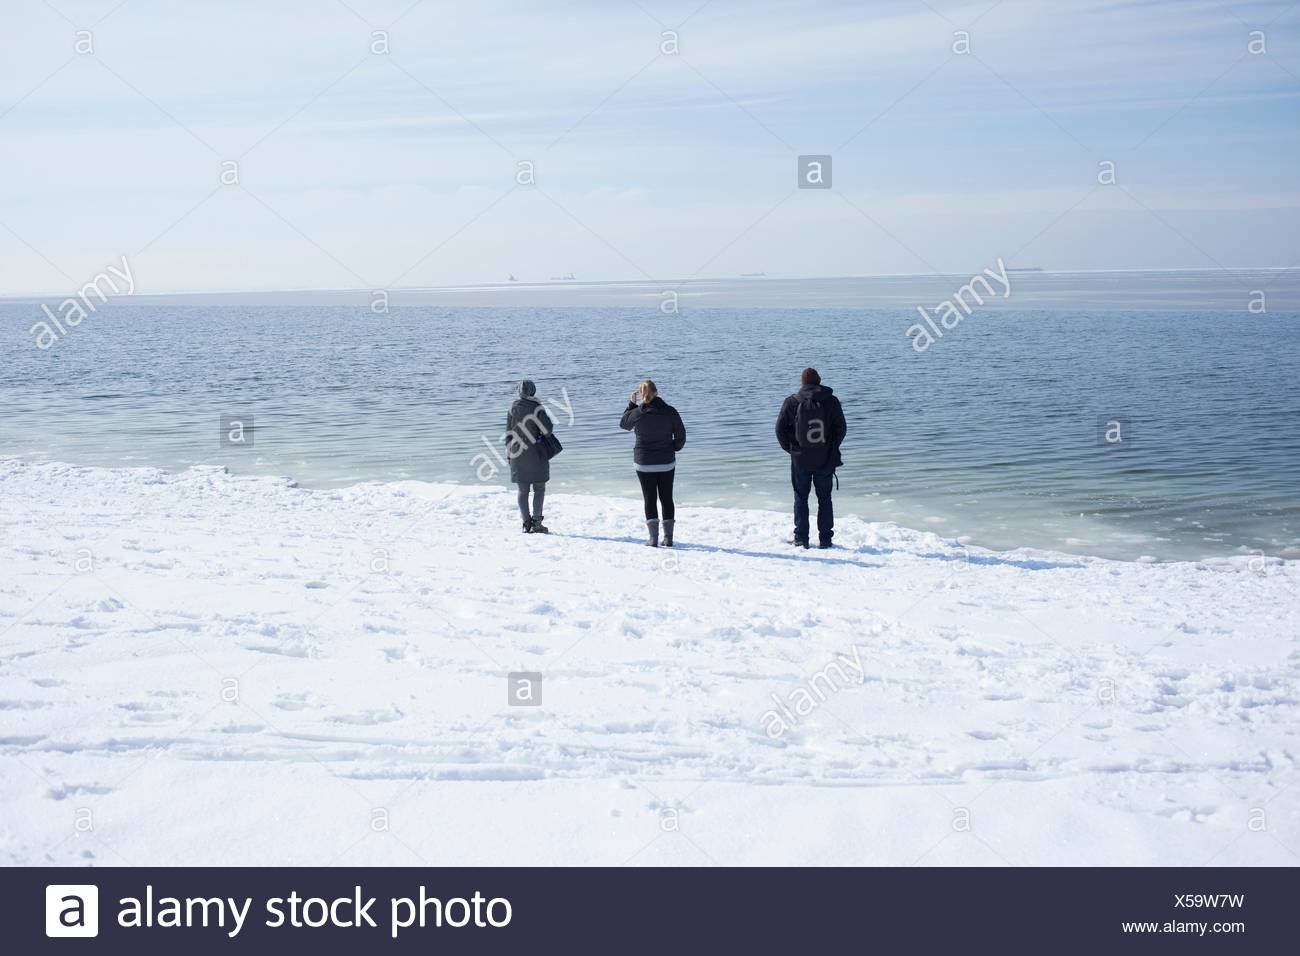 Drei Erwachsene Blick auf das Meer, Fairfield, Connecticut, USA Stockbild